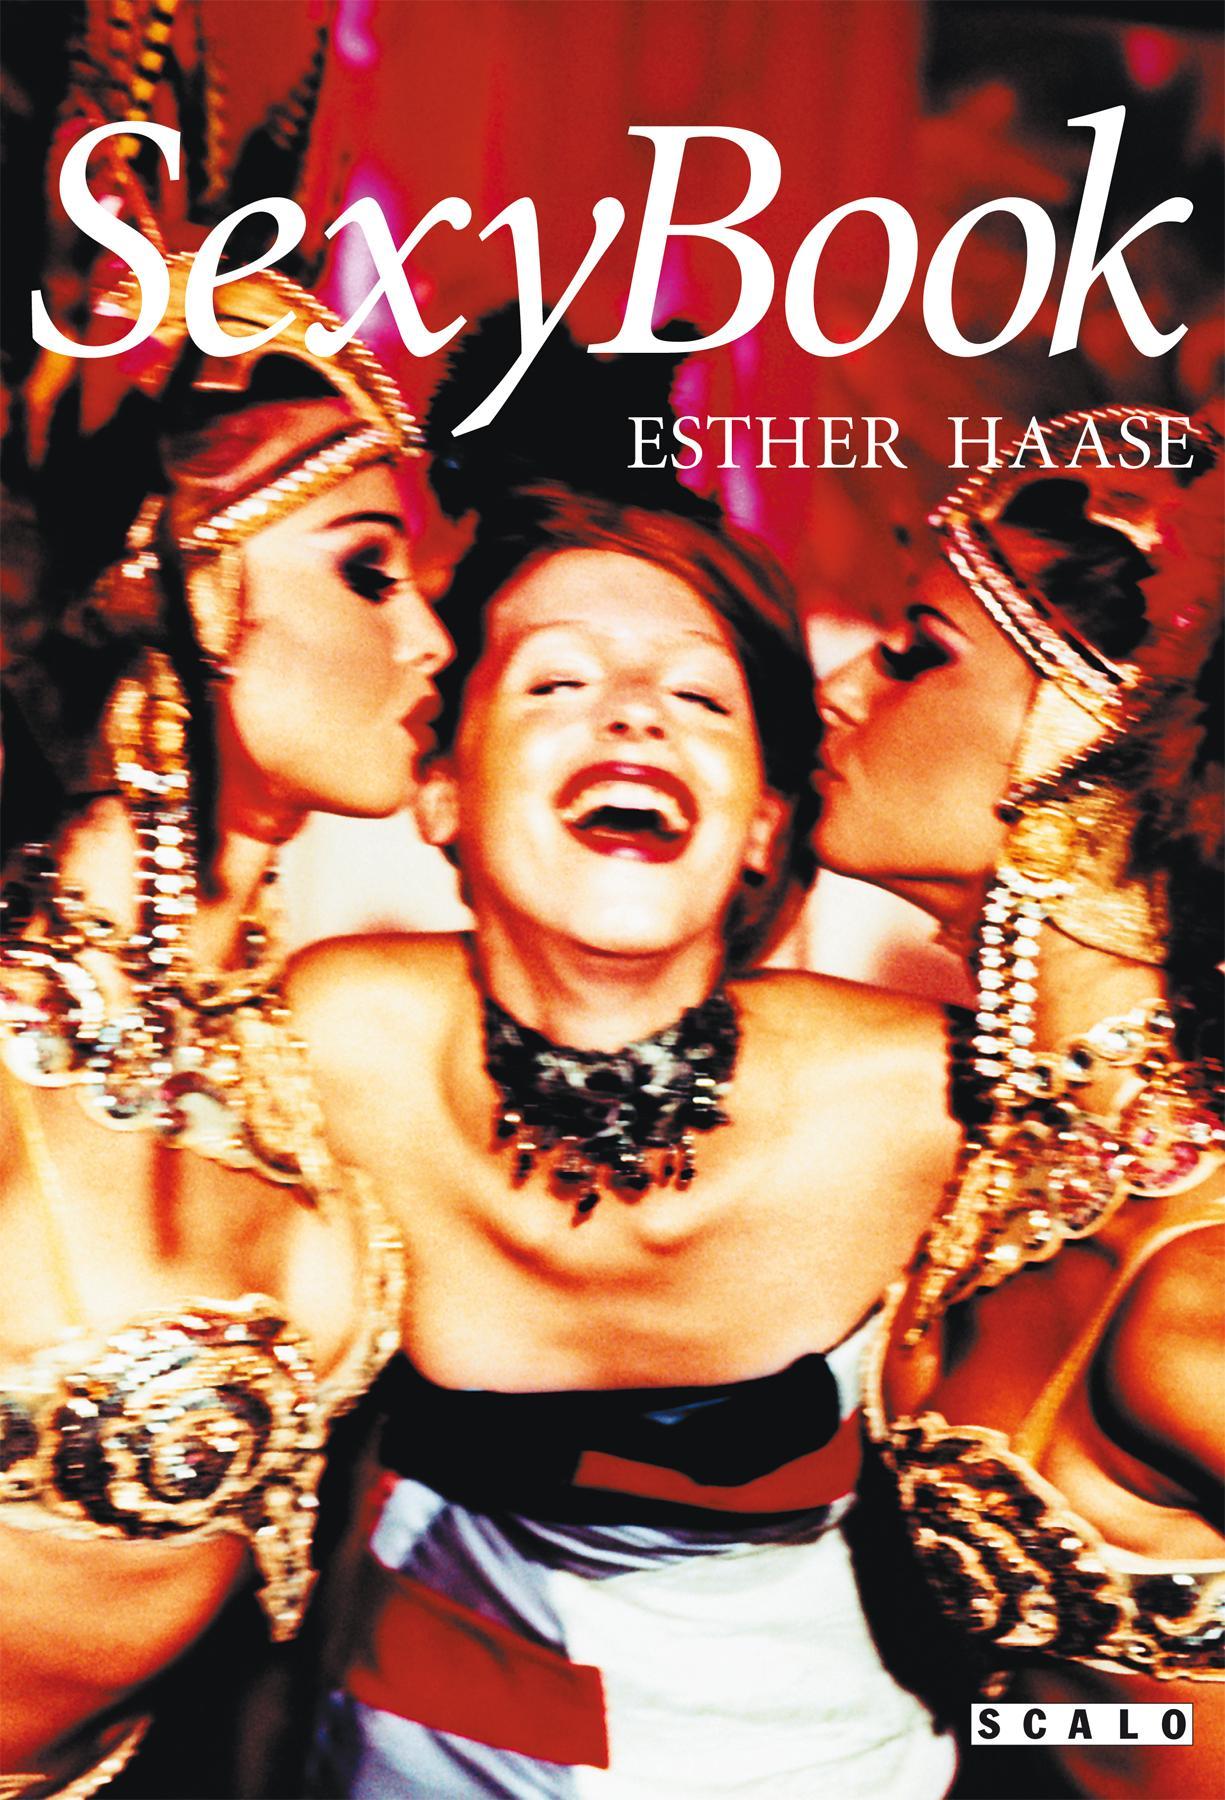 Sexy-Book-Cover1-1225x1800q2.jpg